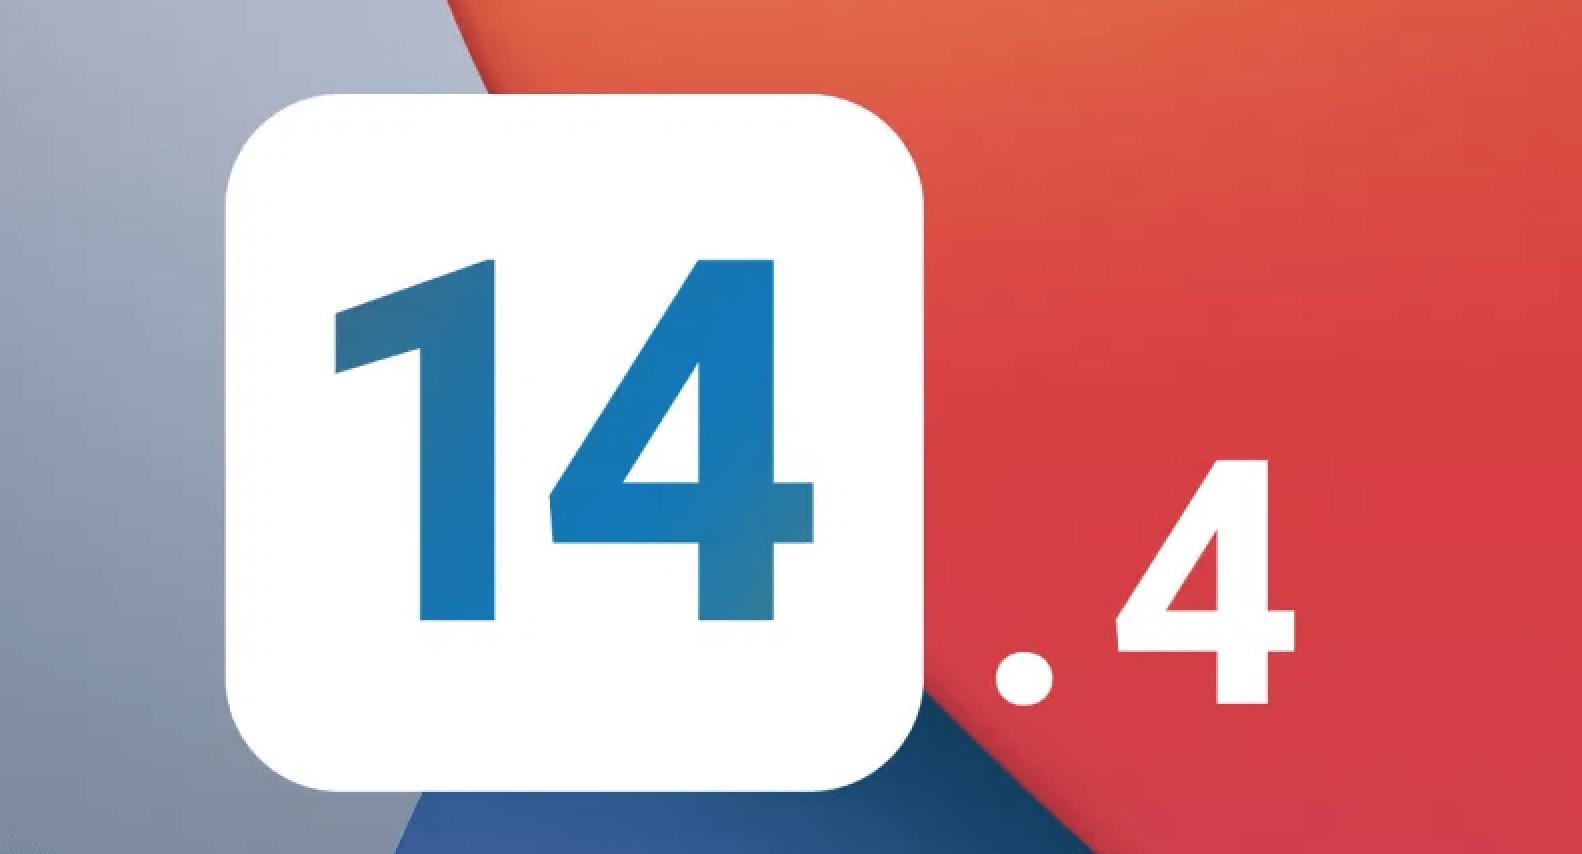 Download di iPadOS 14.4: come scaricarlo